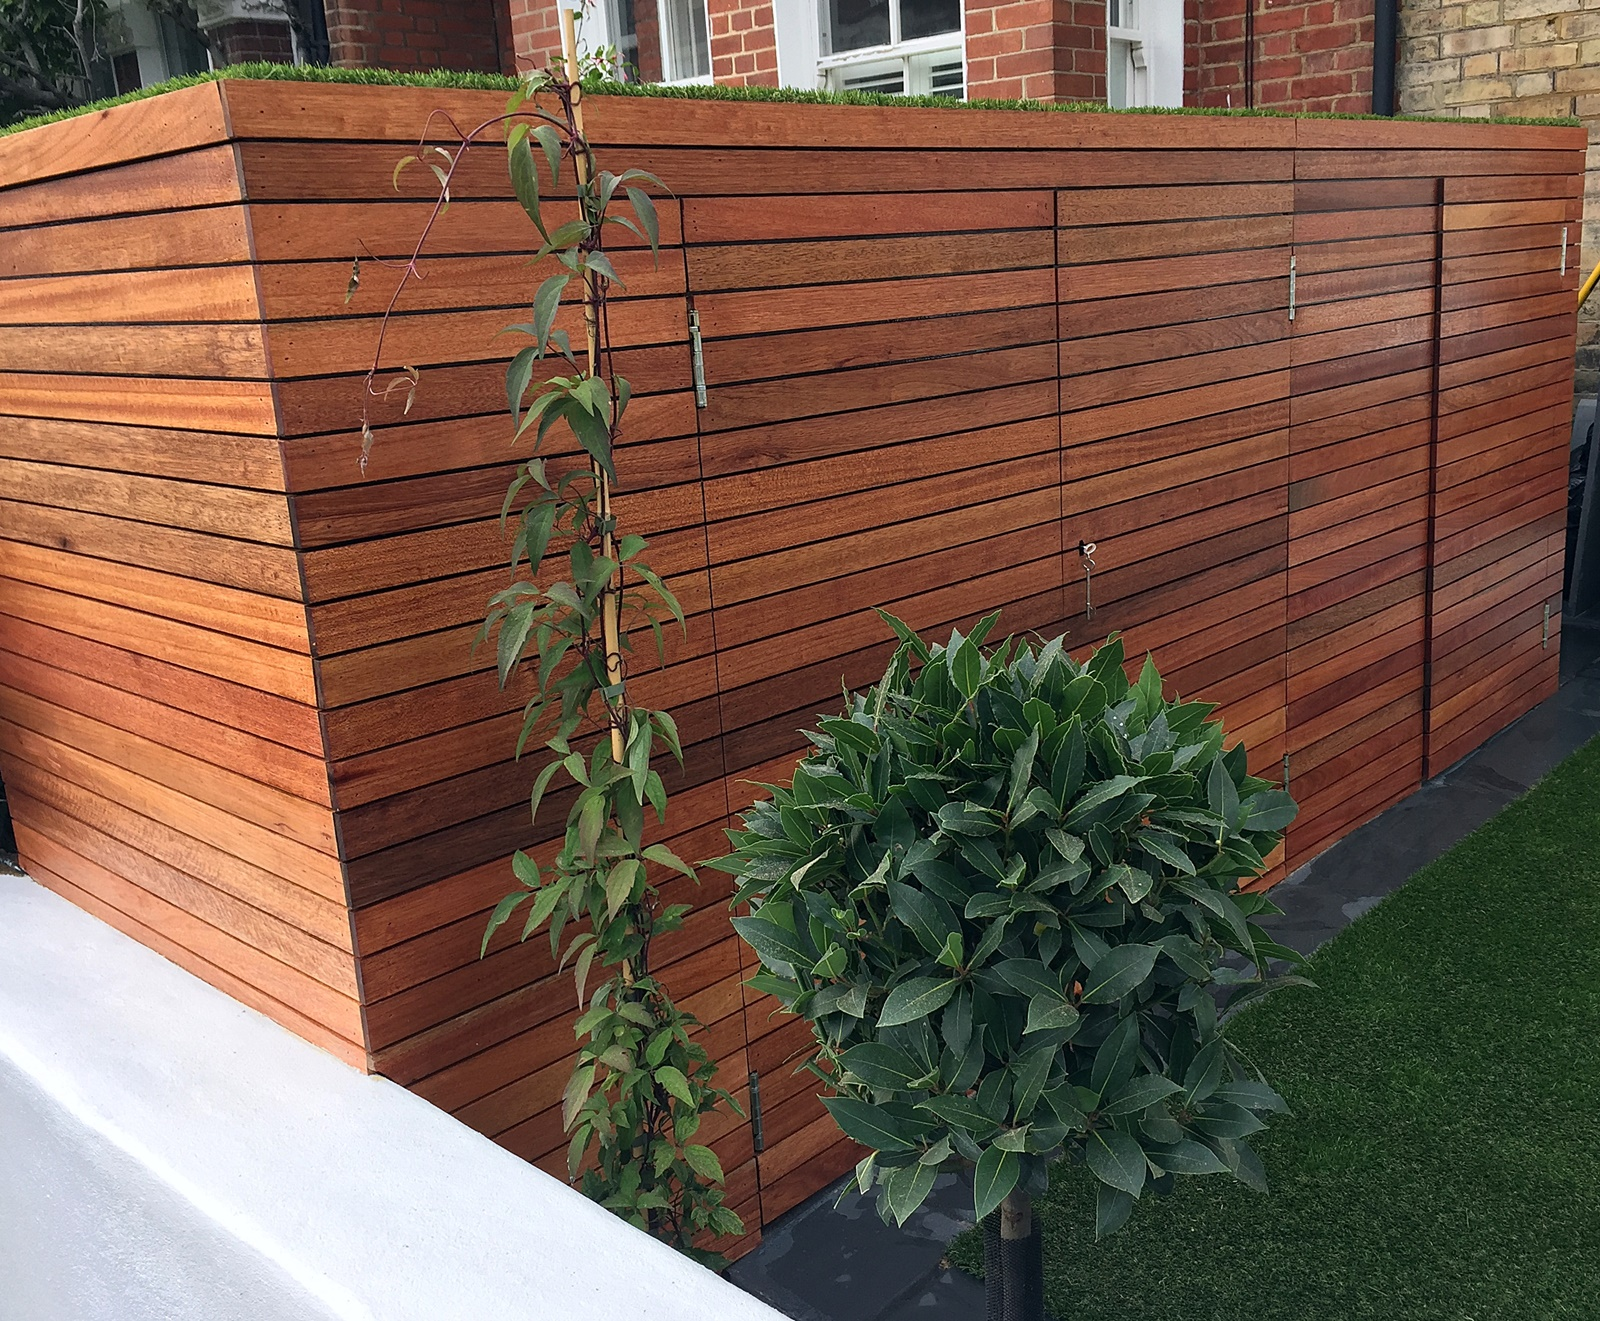 Artificial grass easi hardwood Fulham Wandsworth London new garden modern company